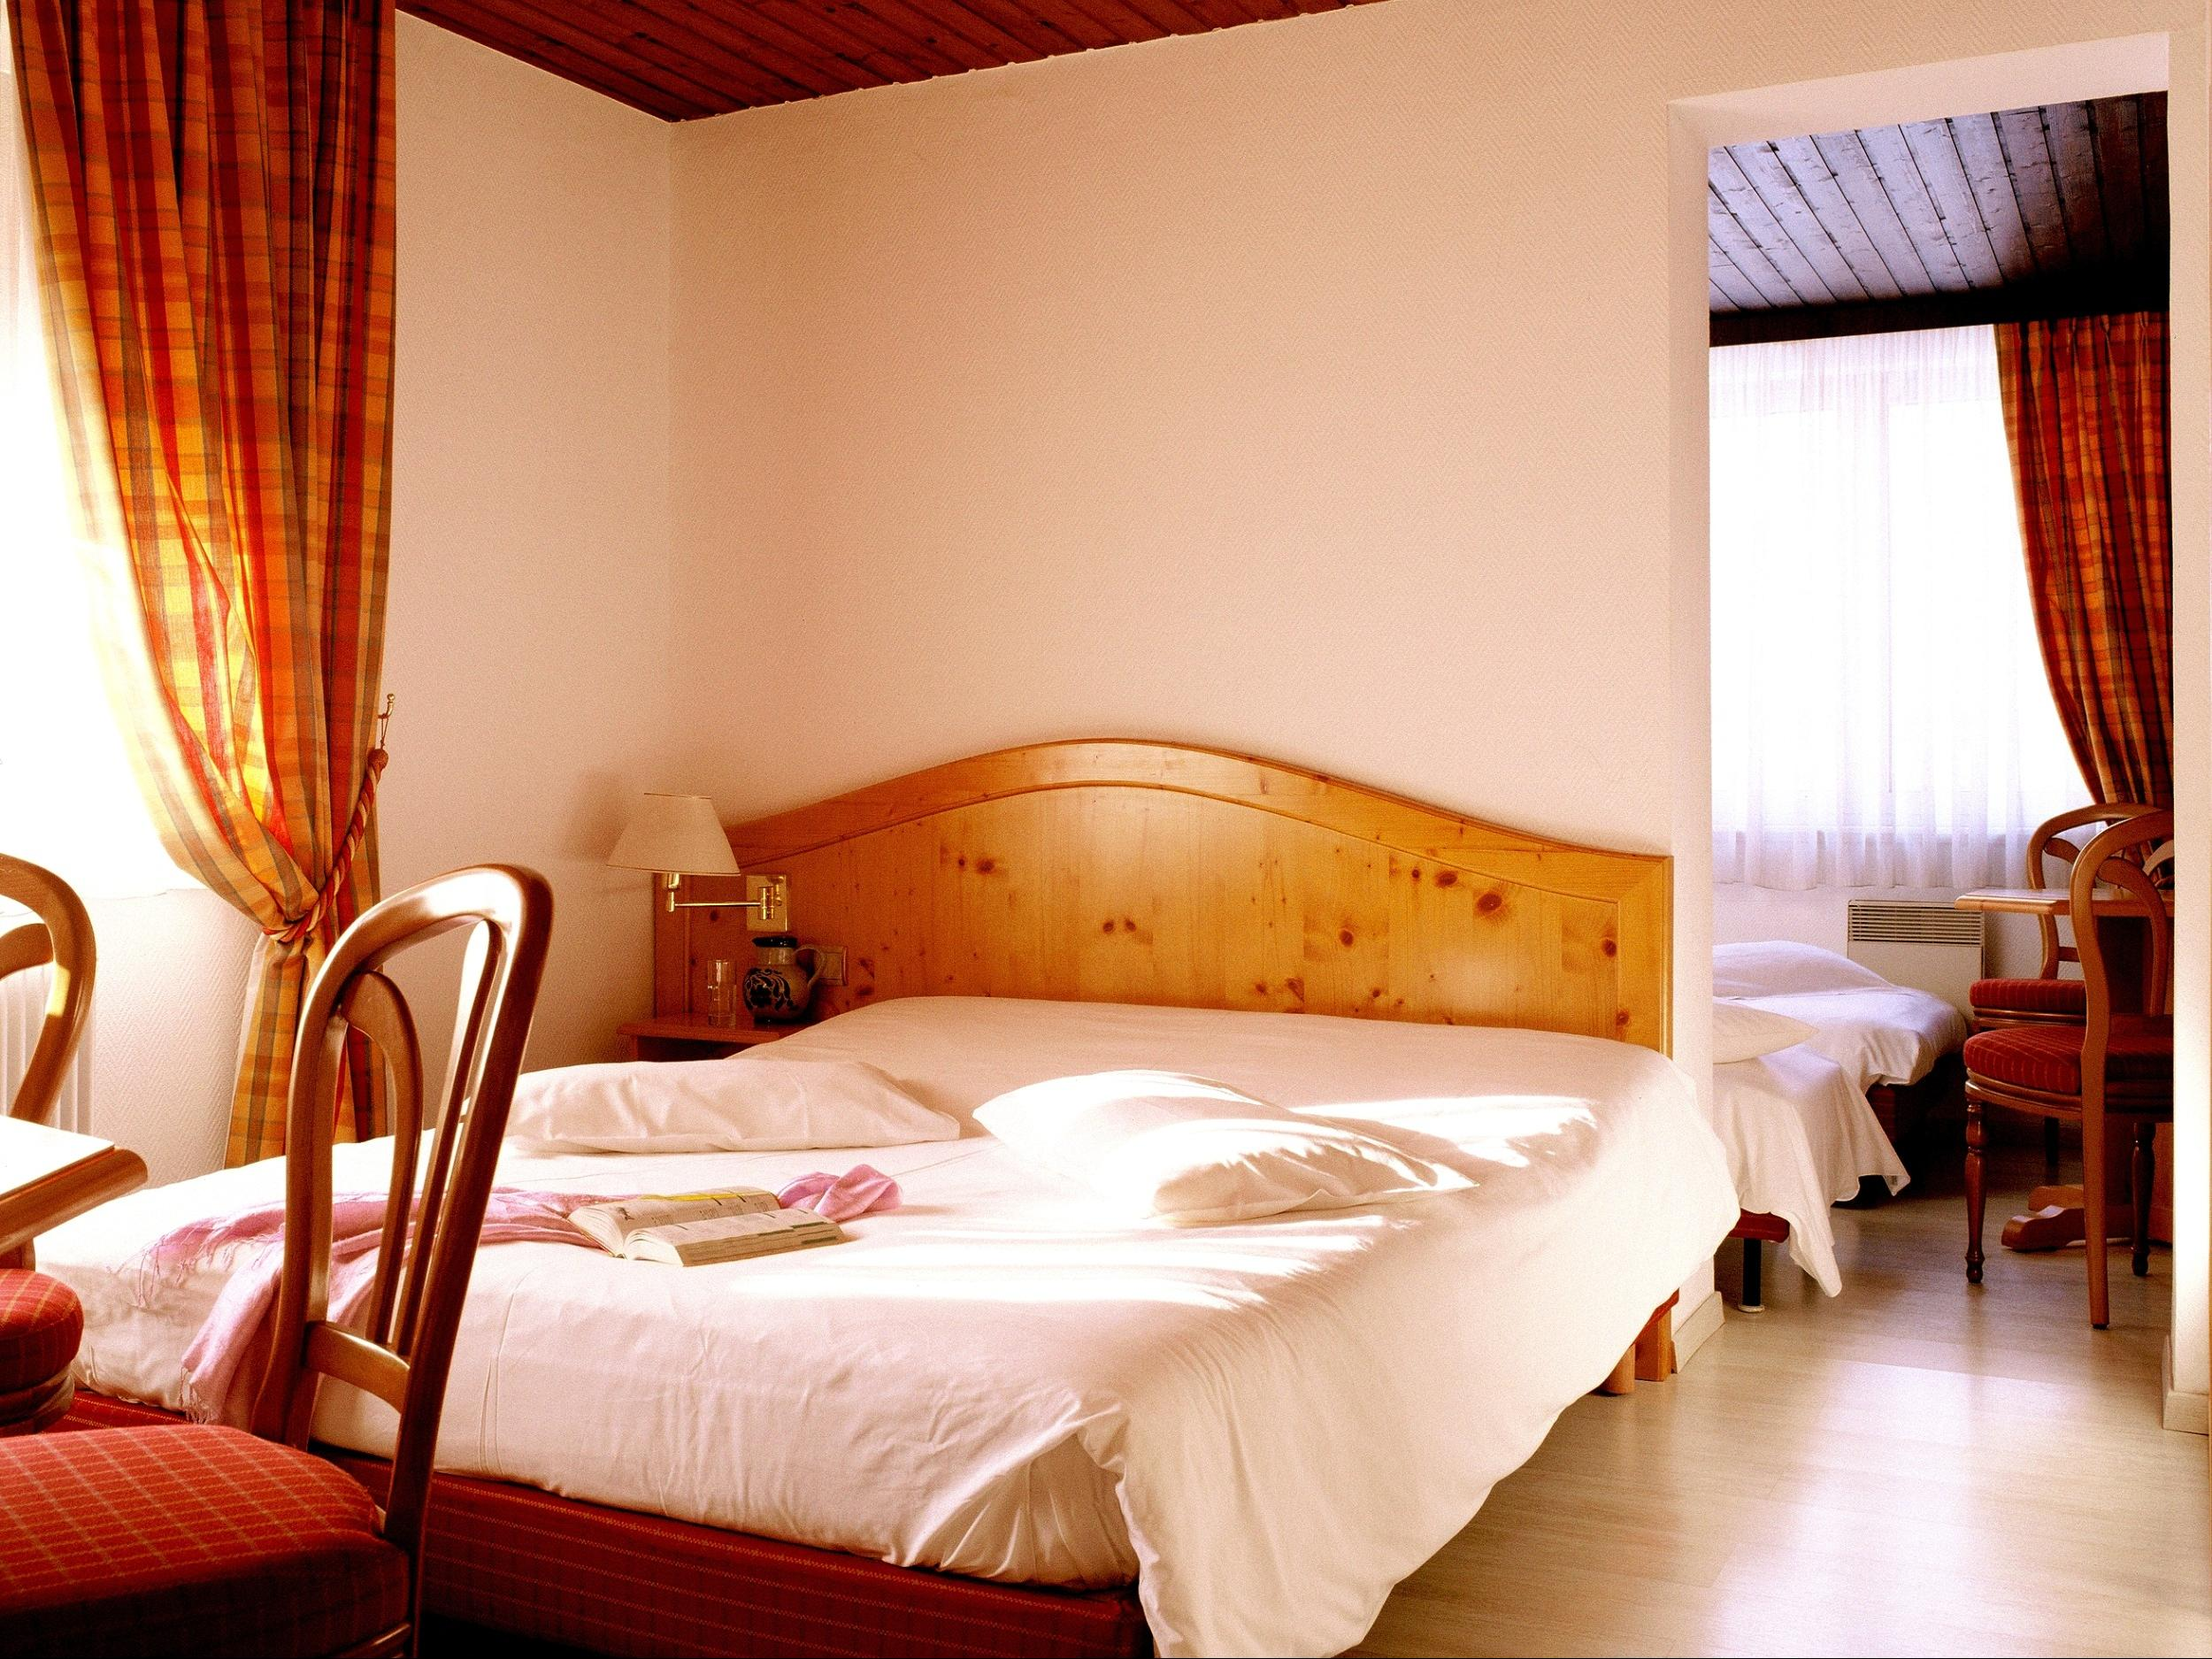 Au Bois Le Sire Orbey - Pilgo Hostellerie Motel Au Bois le Sire Logisà ORBEY